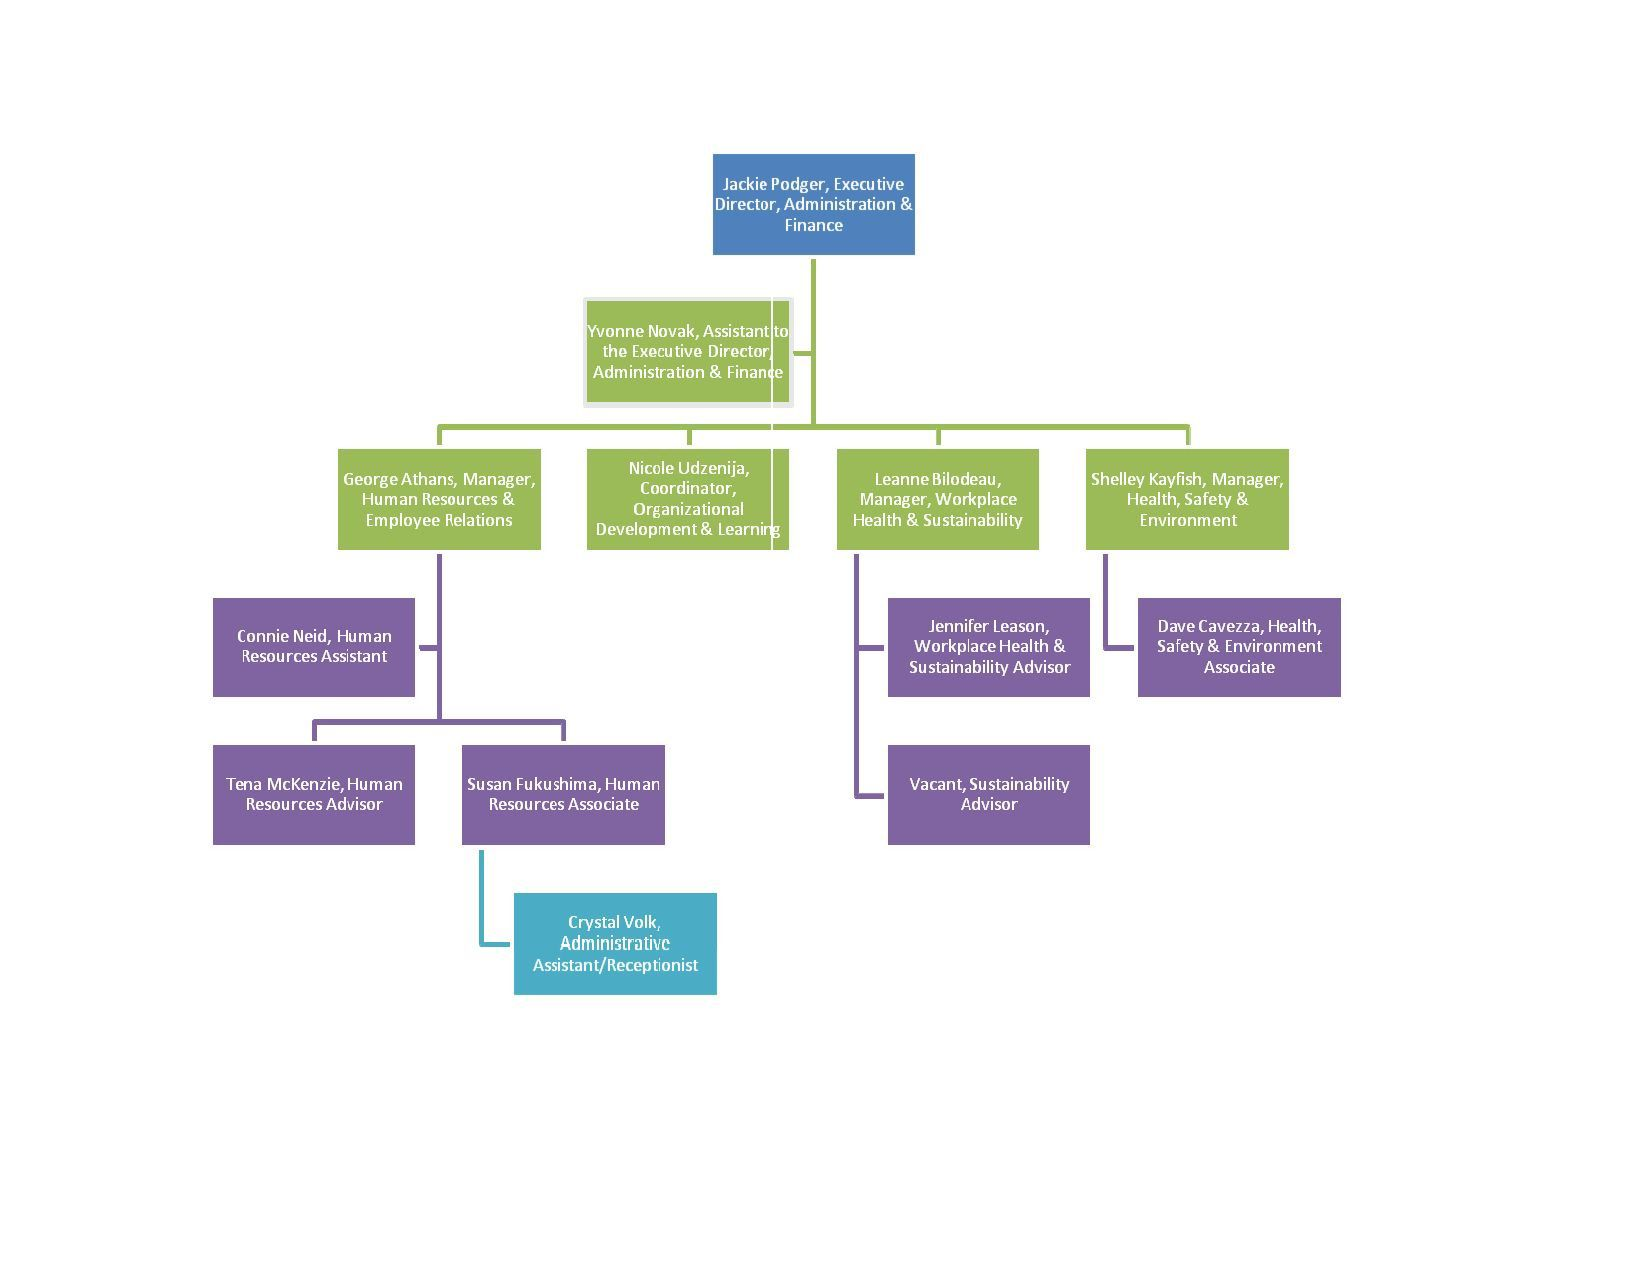 000 Beautiful Organization Chart Template Word 2013 Highest Clarity  Organizational Free In MicrosoftFull